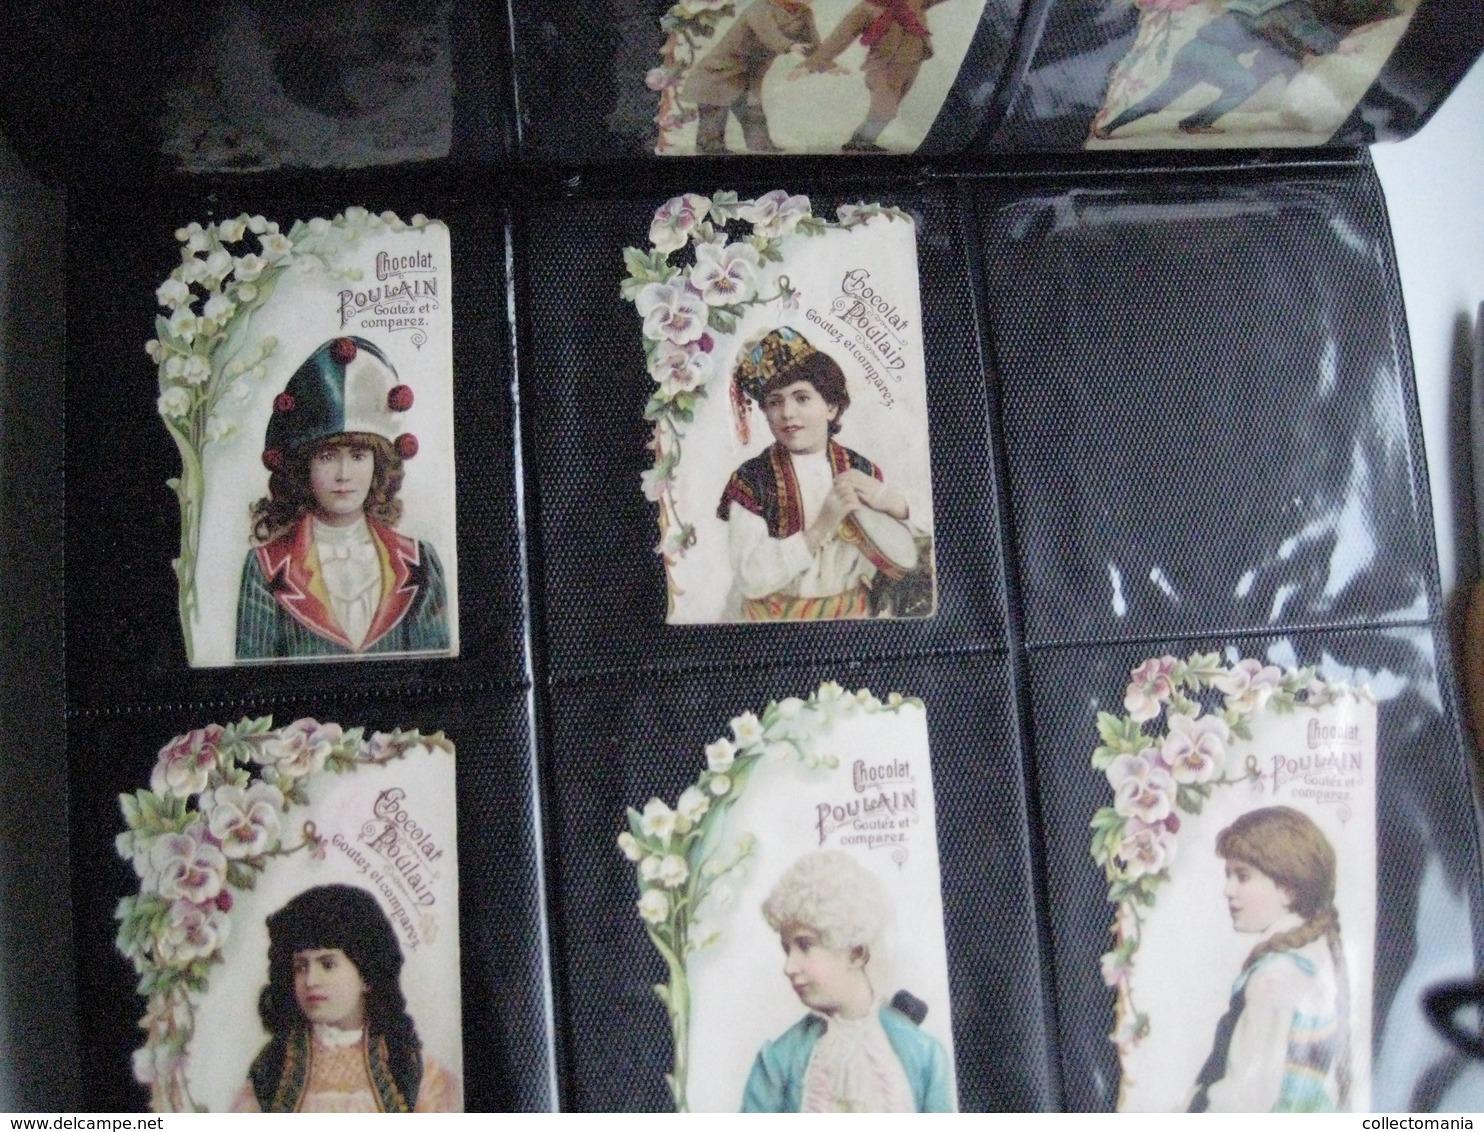 SCRAPS Van Vóór 1900, Alle Maten In 19 Mappen +7 Mappen RECLAME 20cmX15cm +10 Albums De Collection 1880 à 1890 Relief - Sonstige